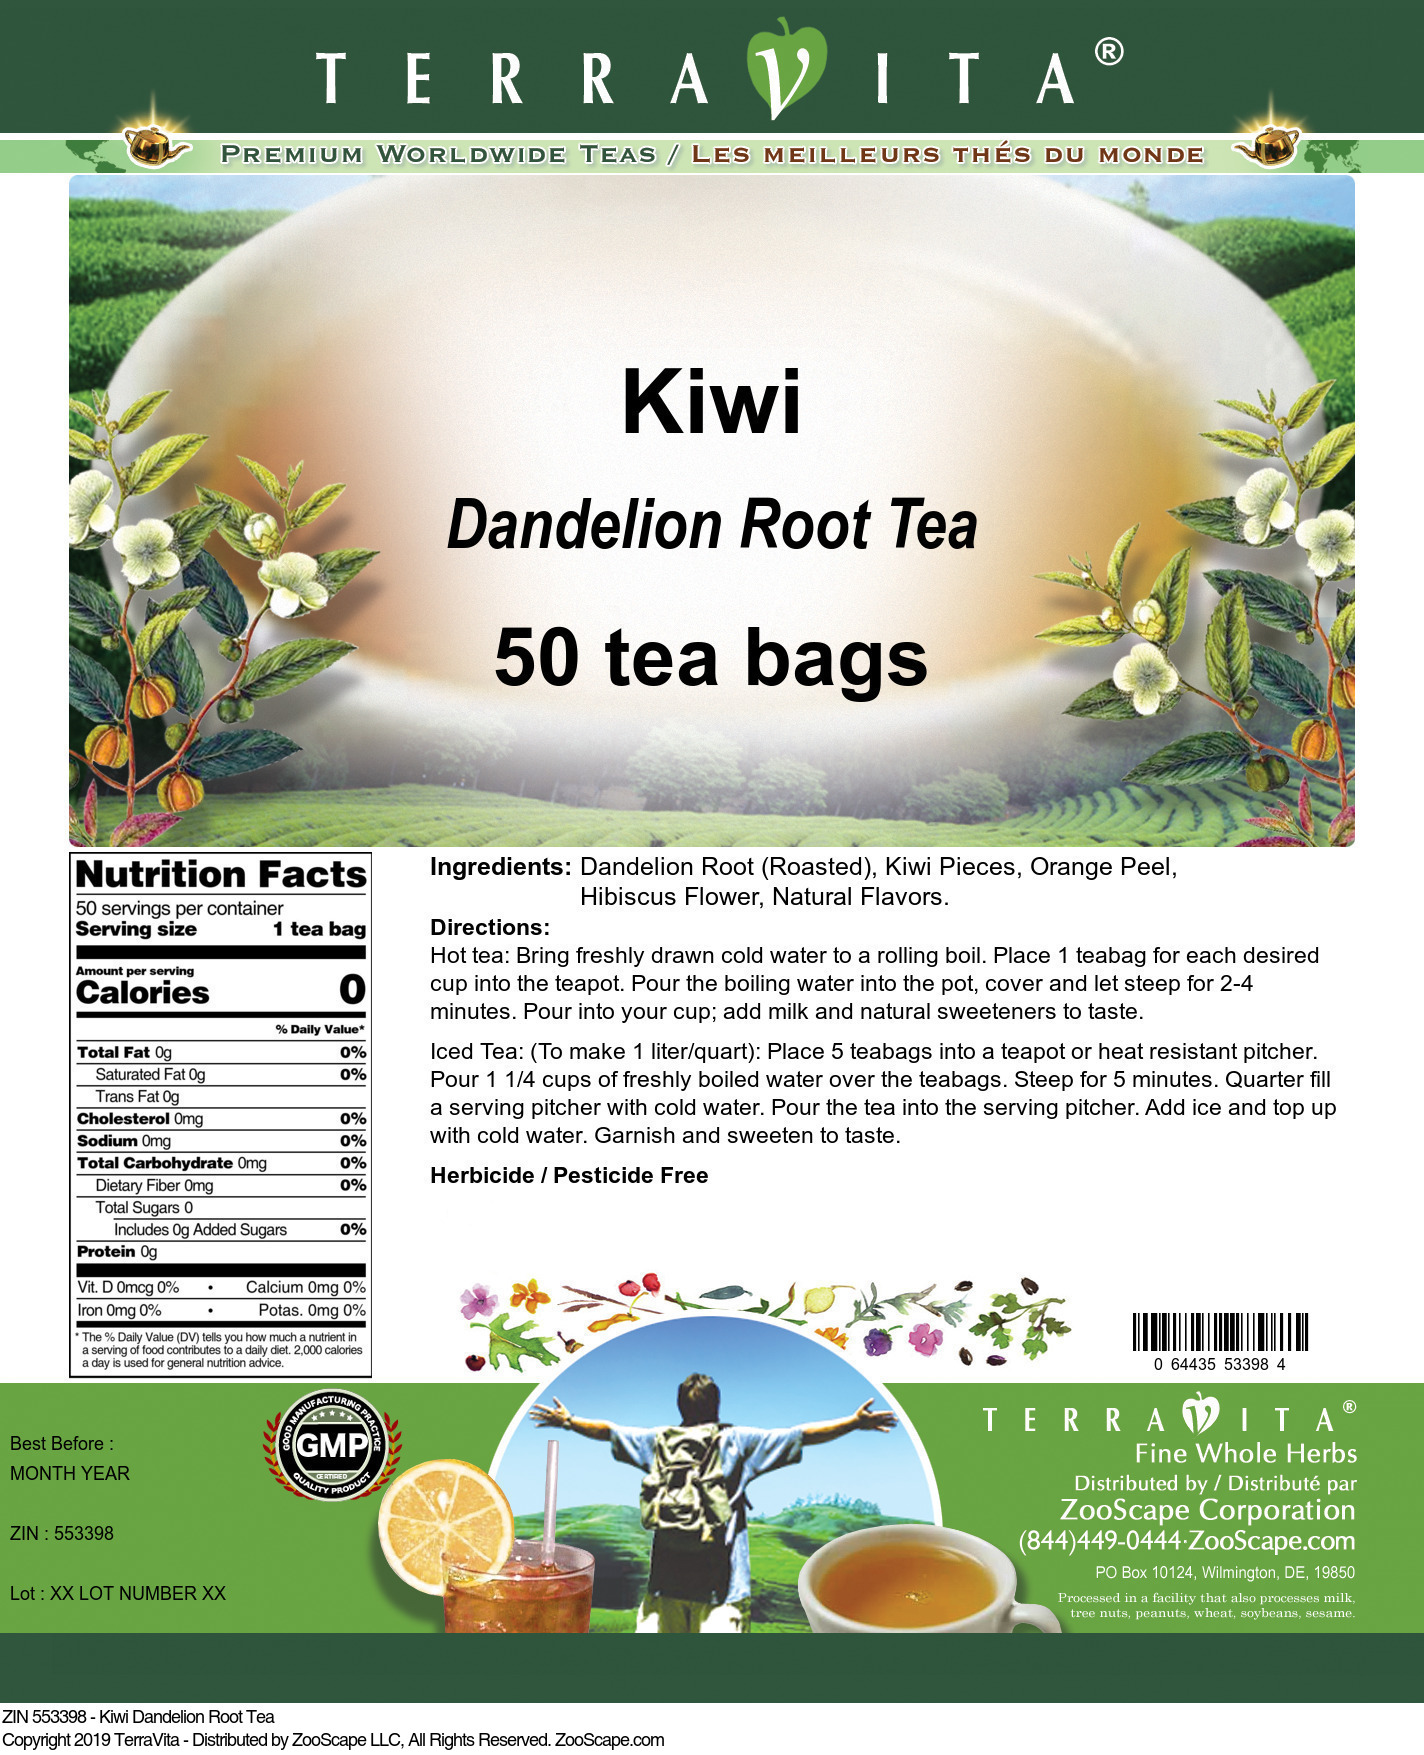 Kiwi Dandelion Root